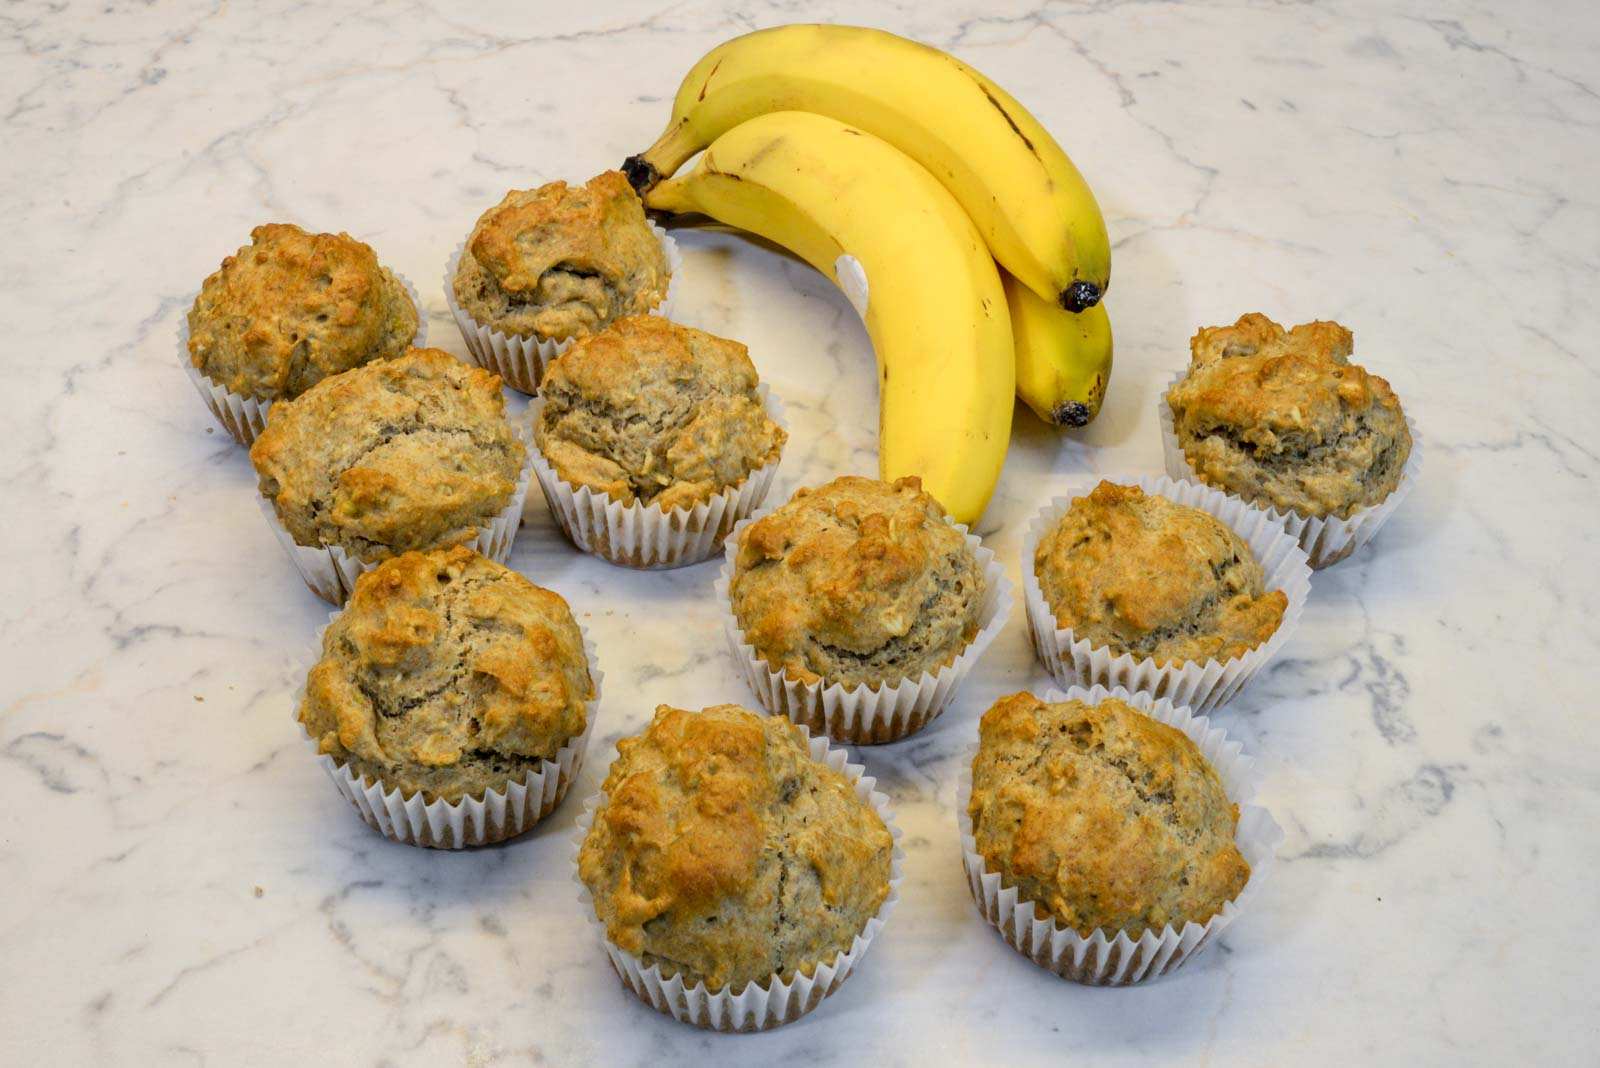 Thumbnail Baby Bananen Muffins